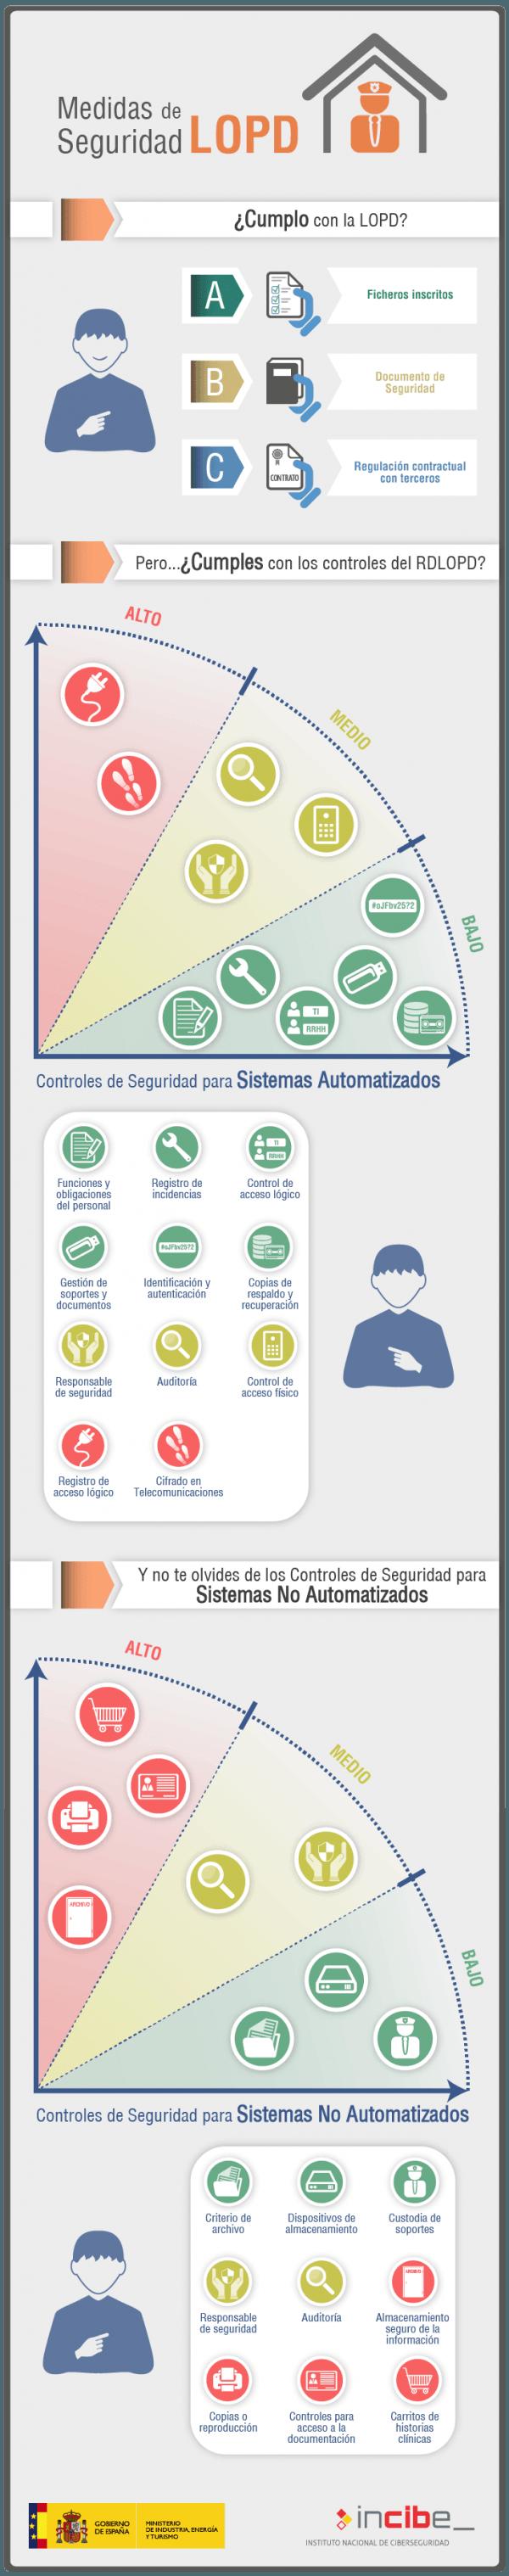 infografia-medidas-de-seguridad-lopd[1]